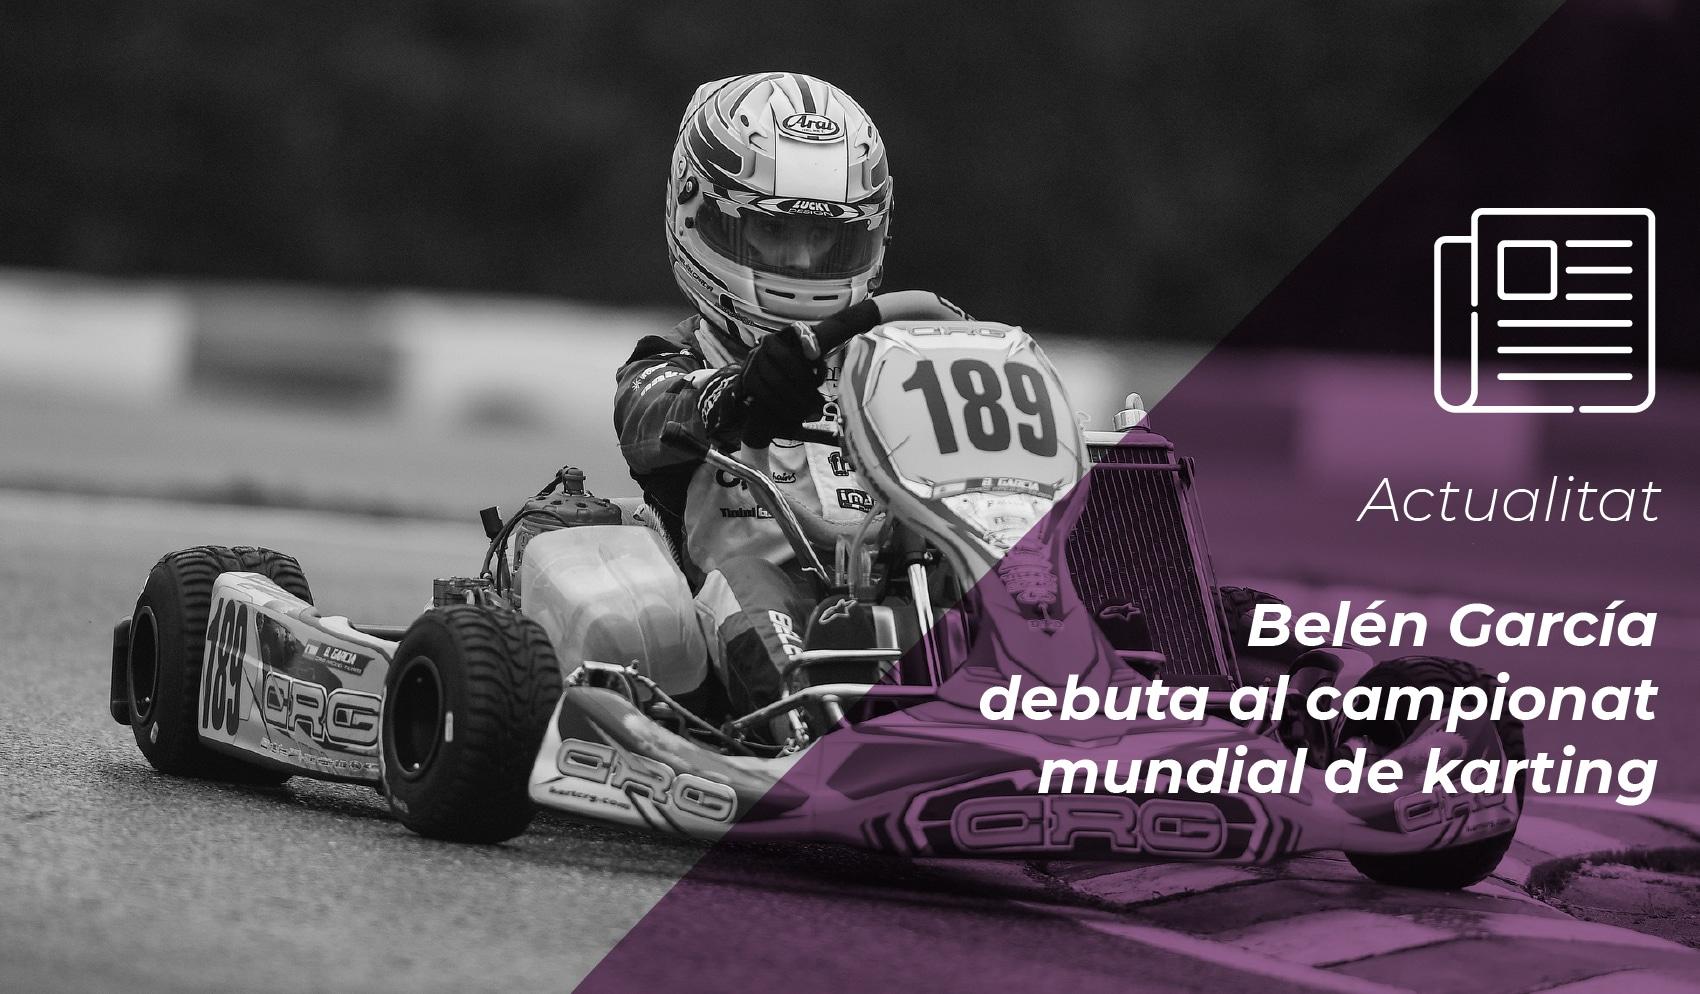 Belén García debuta al campionat mundial de karting 4